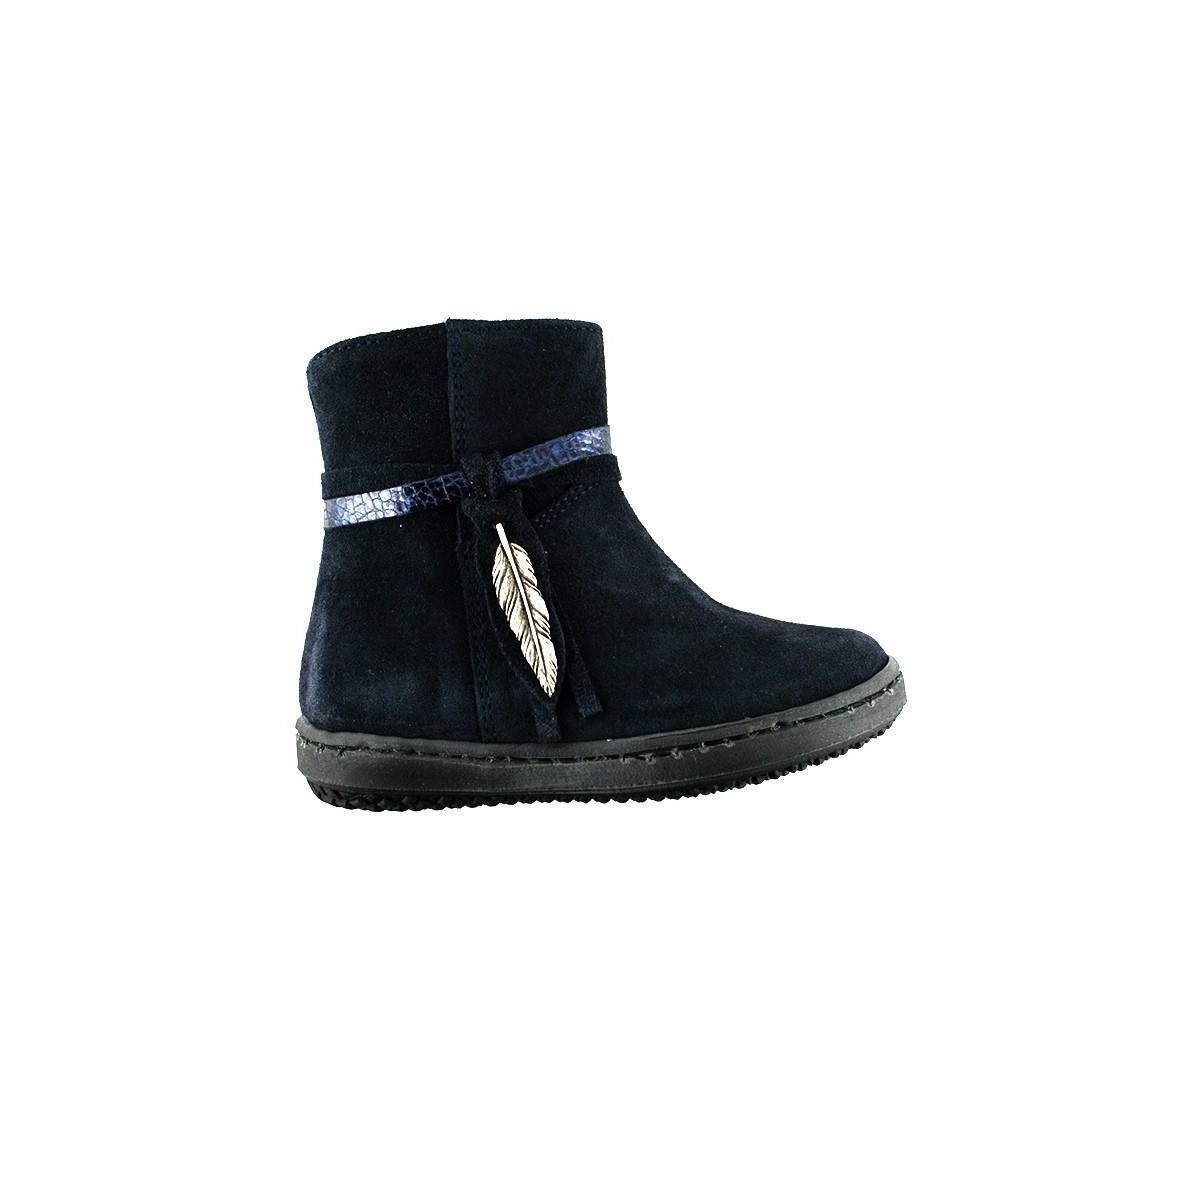 Boots Fuzzy peau marine